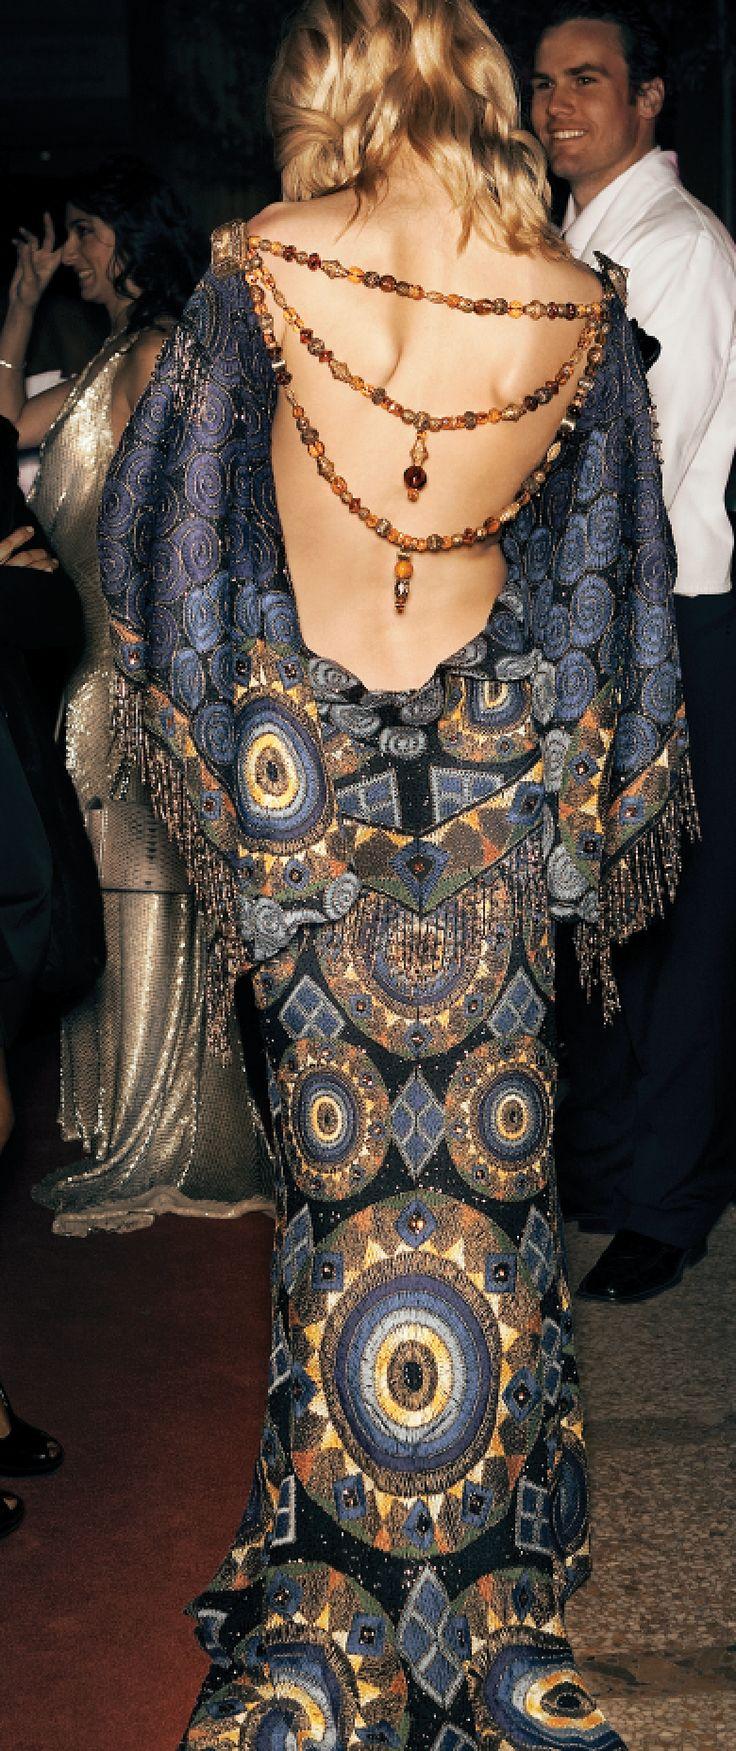 John Galliano for Christian Dior Spring Summer 1998 Haute Couture